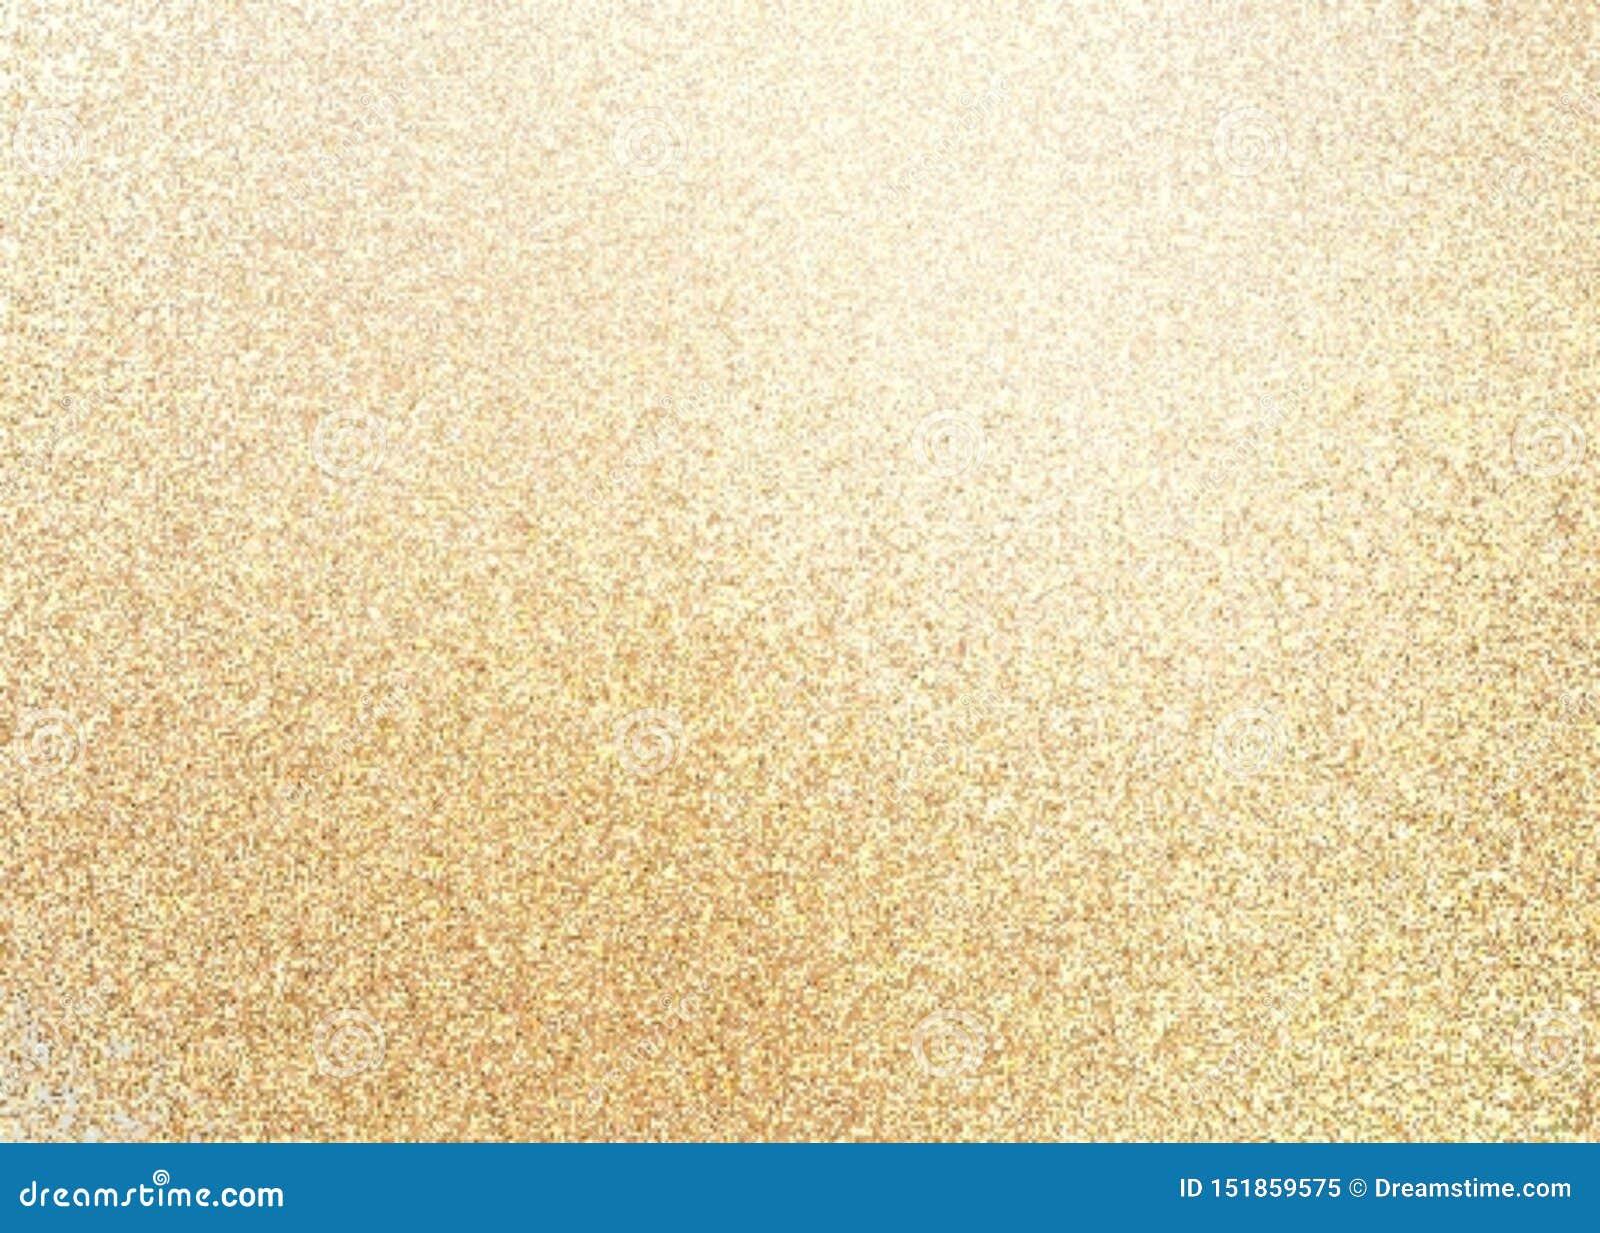 Shimmer piaska abstrakta złota tekstura